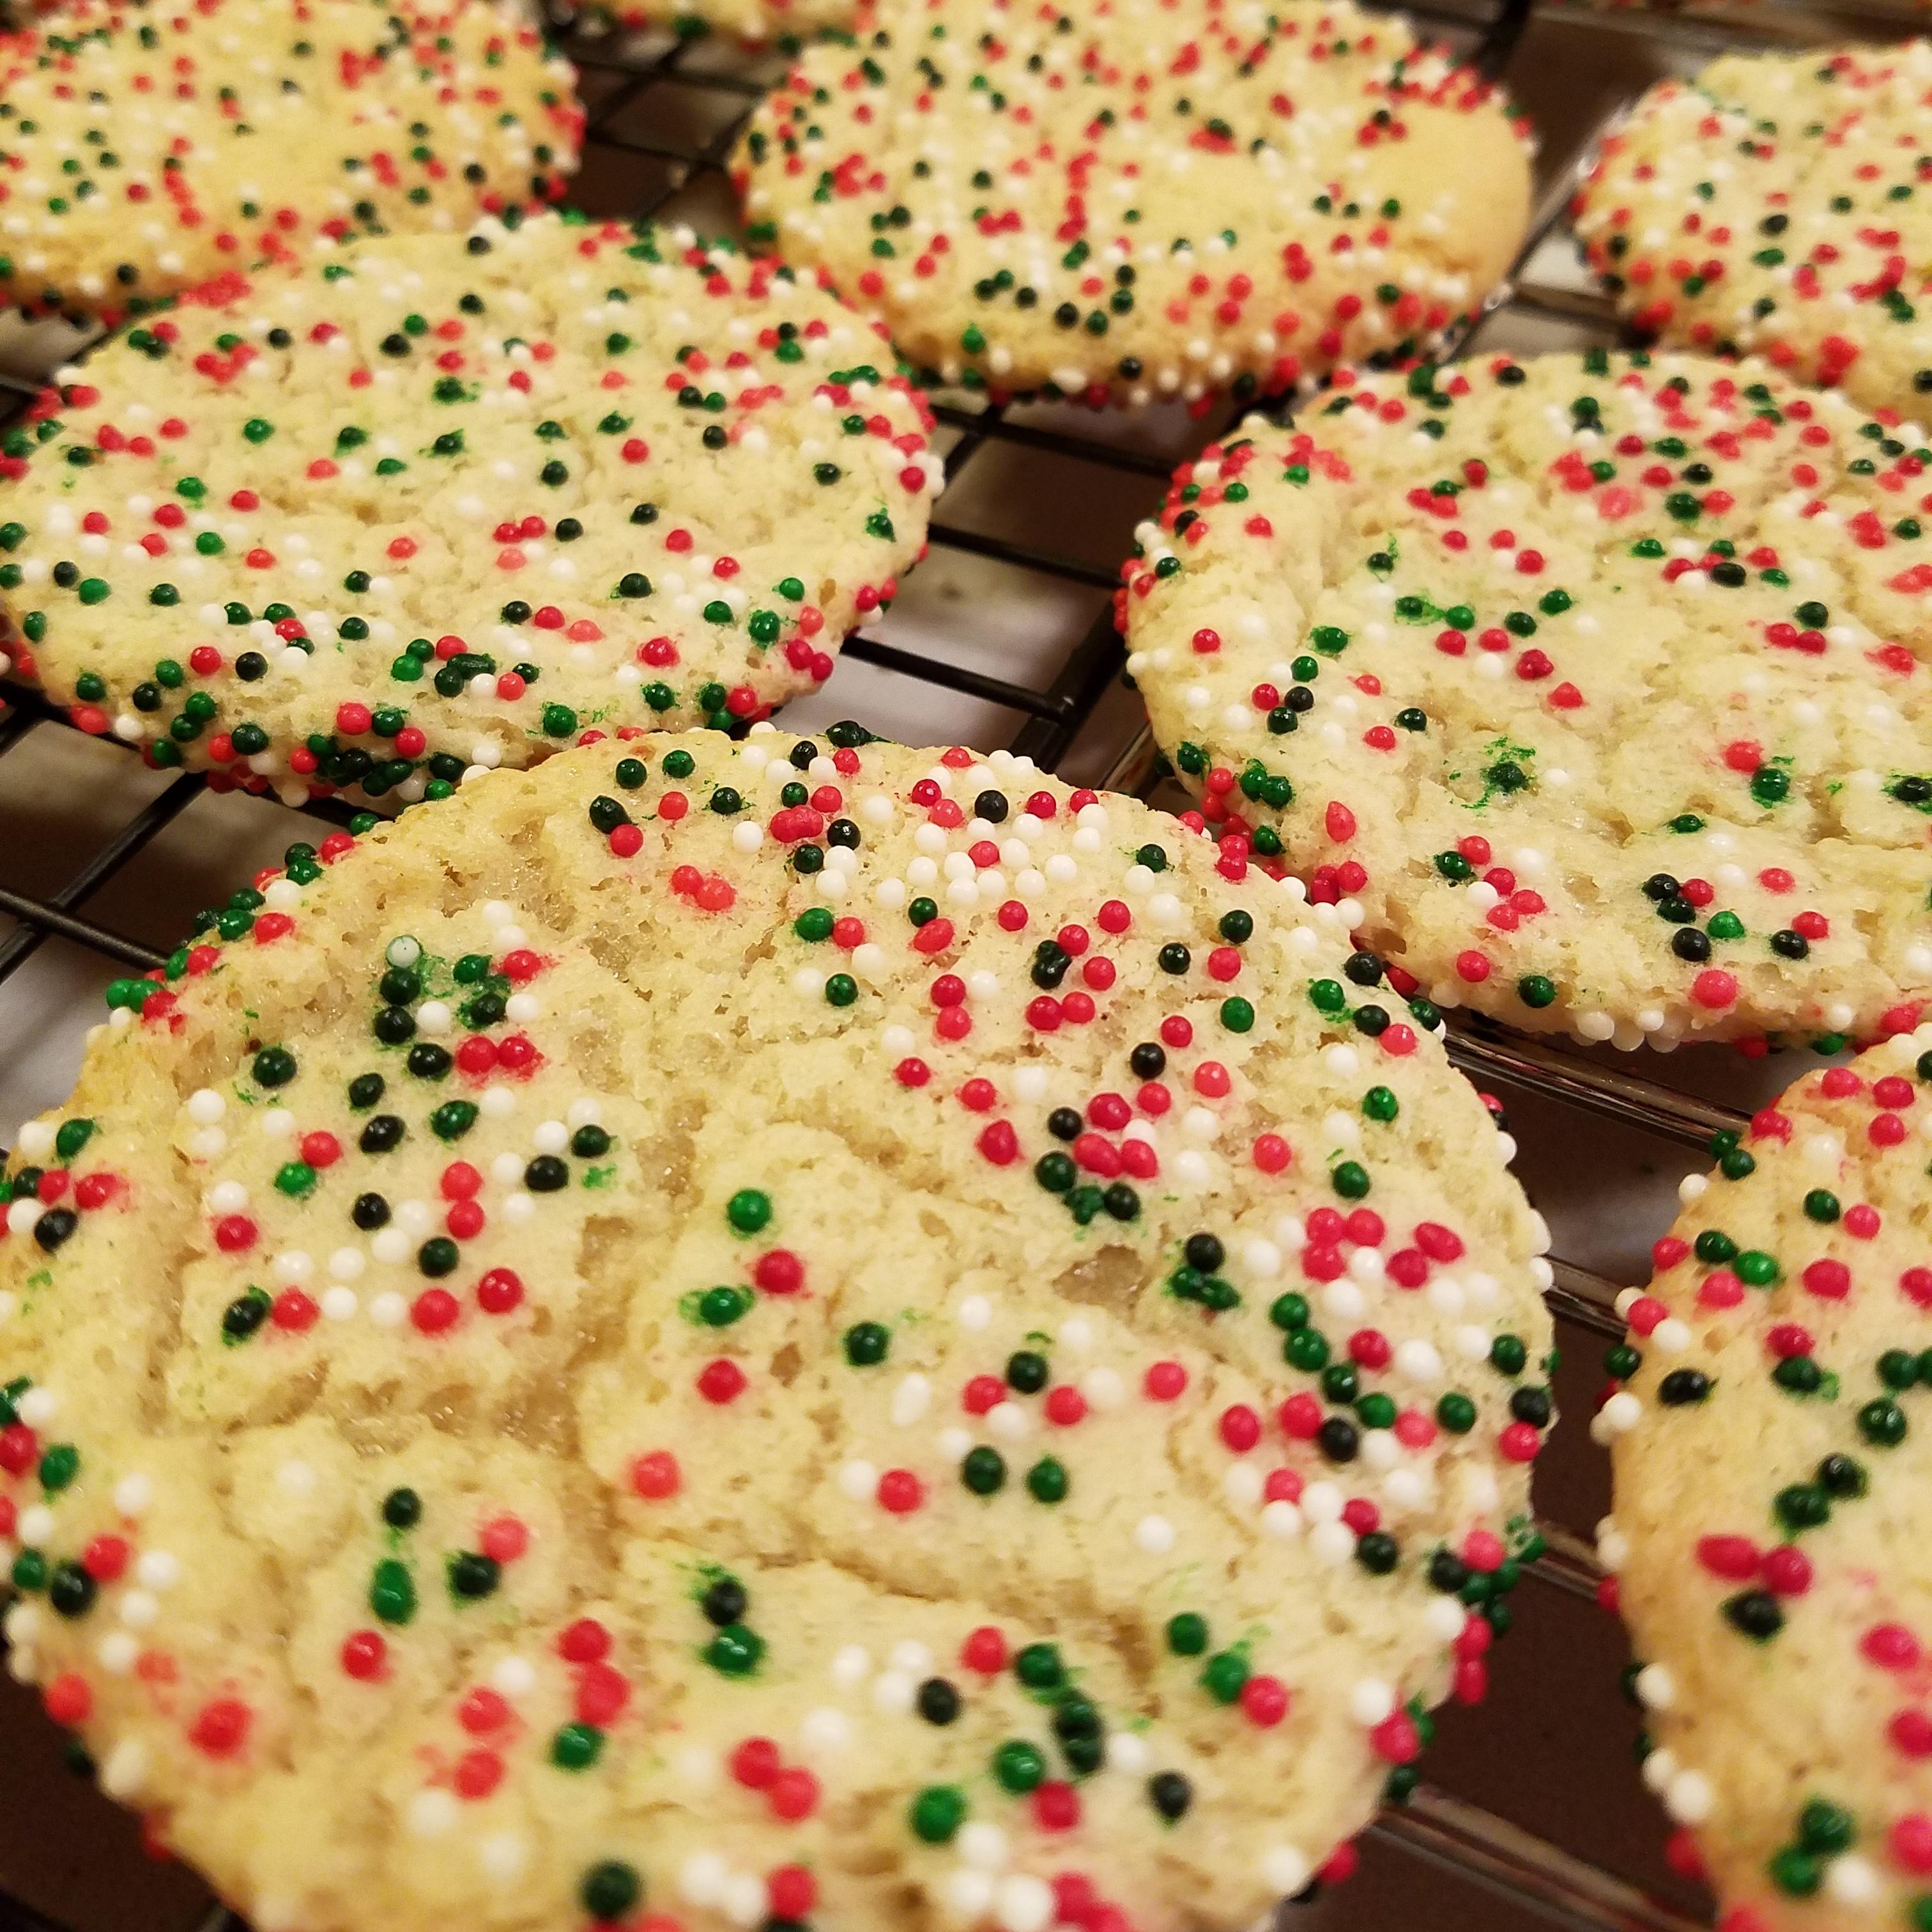 Cookiepalooza My Christmas Cookie Tradition A Sip Of Sakki